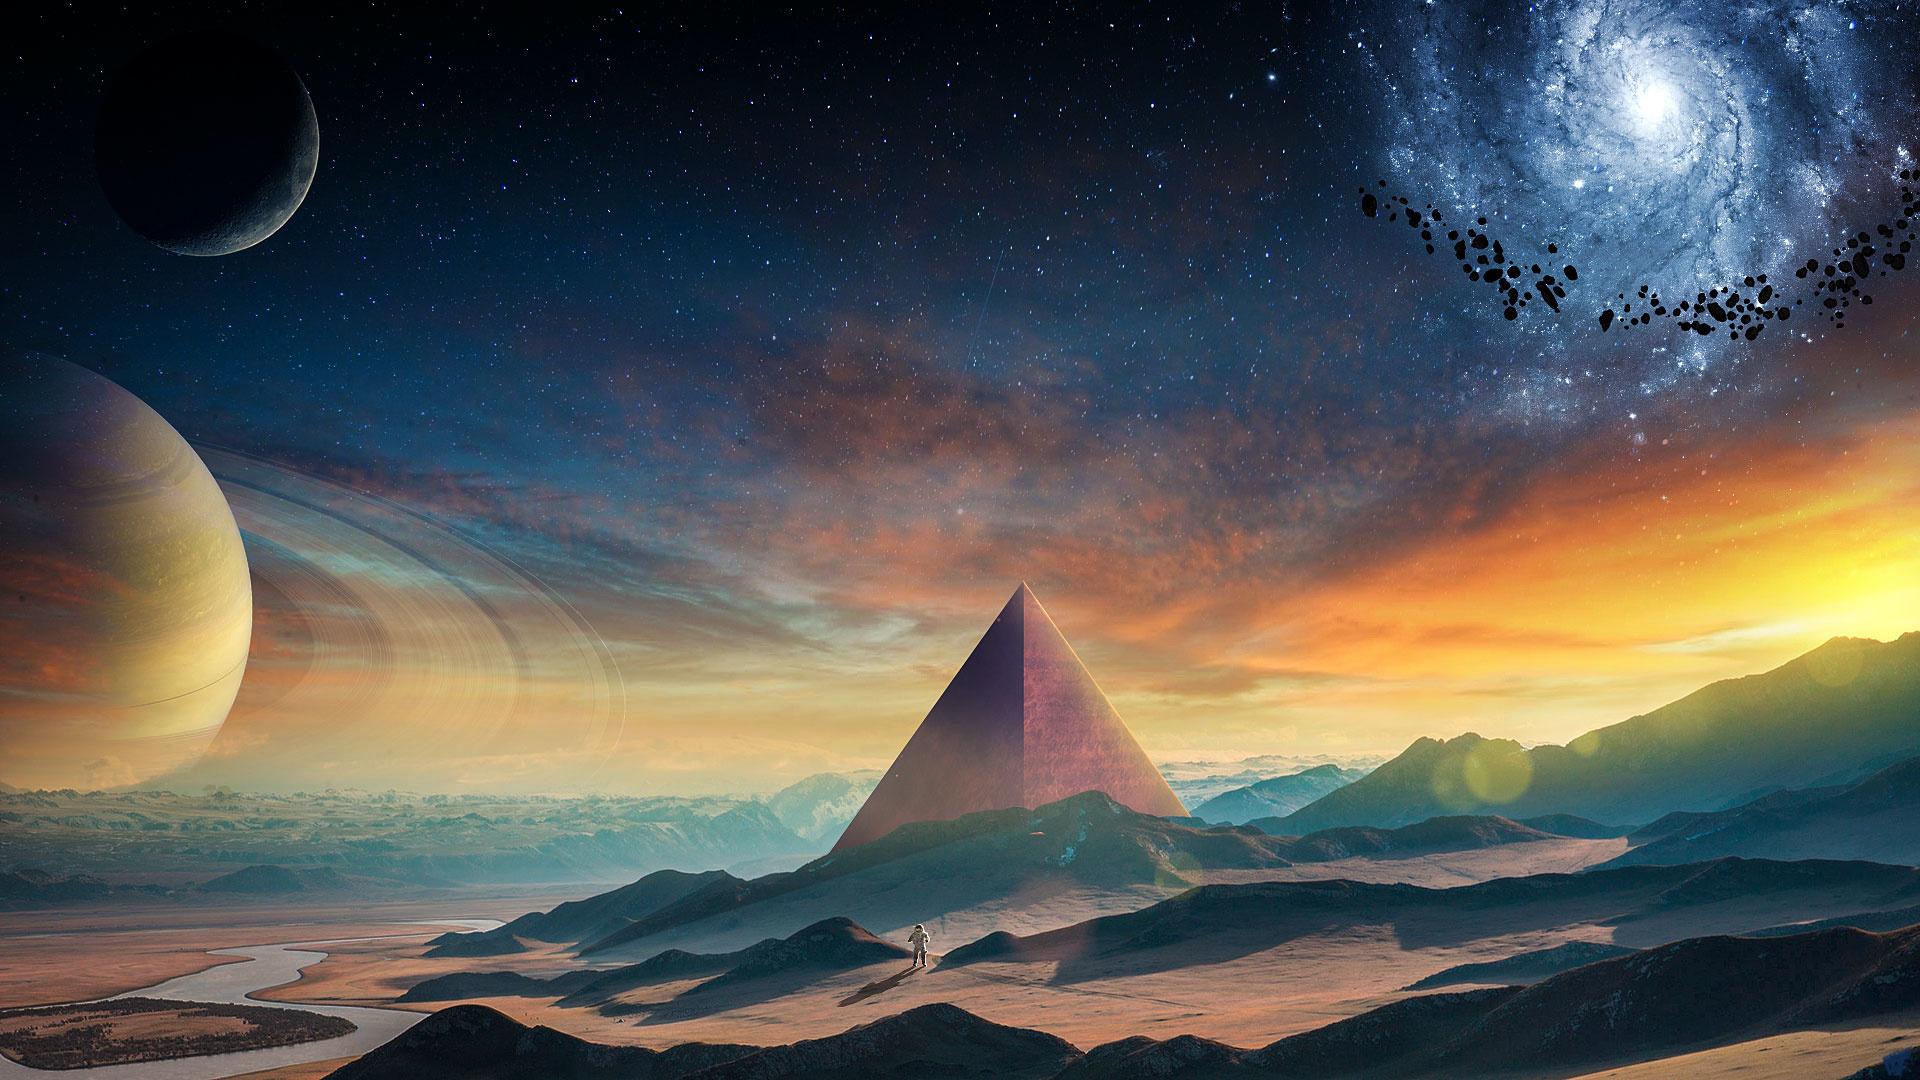 Samsung Galaxy S X 1920 Cars Download 1920x1080 Wallpaper Planet Fantasy Pyramids